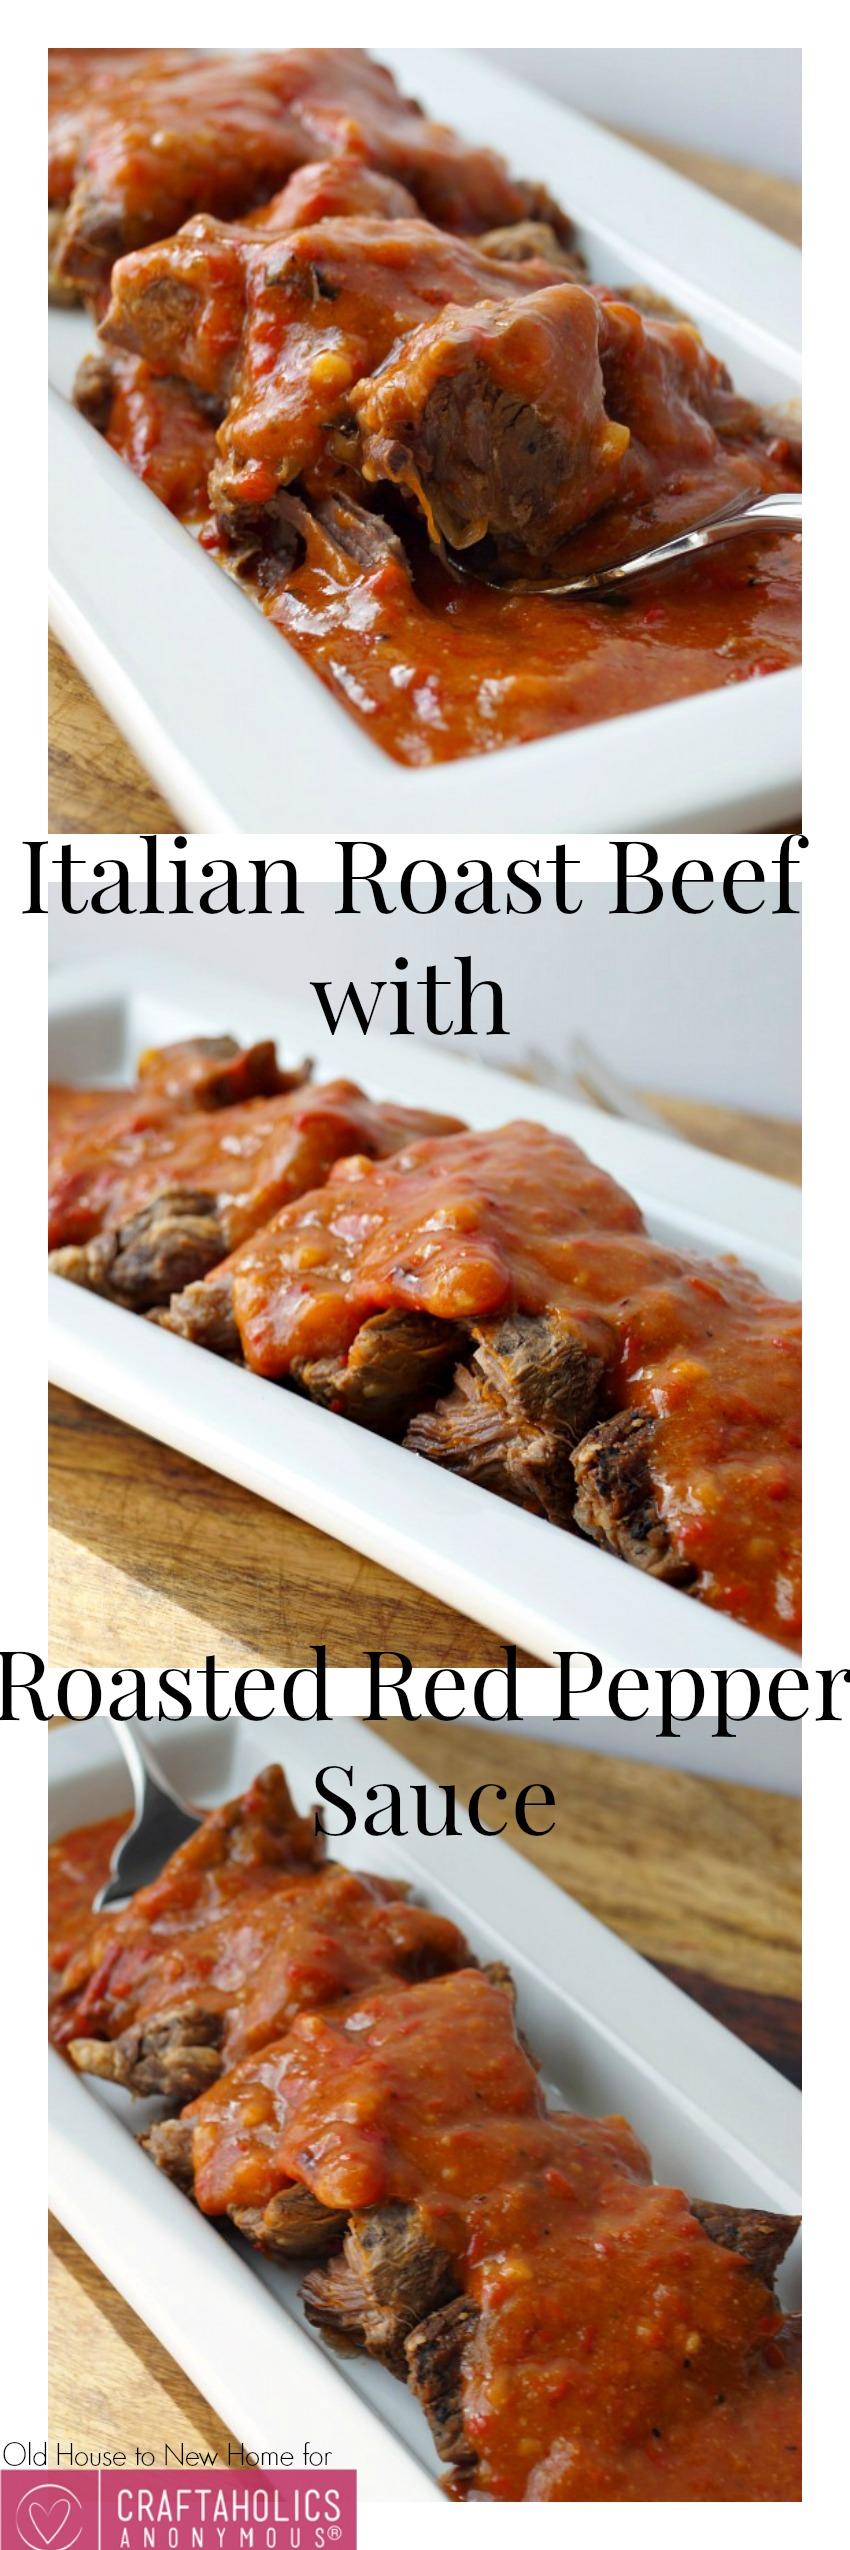 Italian Roast Beef with Roasted Red Pepper Sauce    BEST roast beef recipe ever!